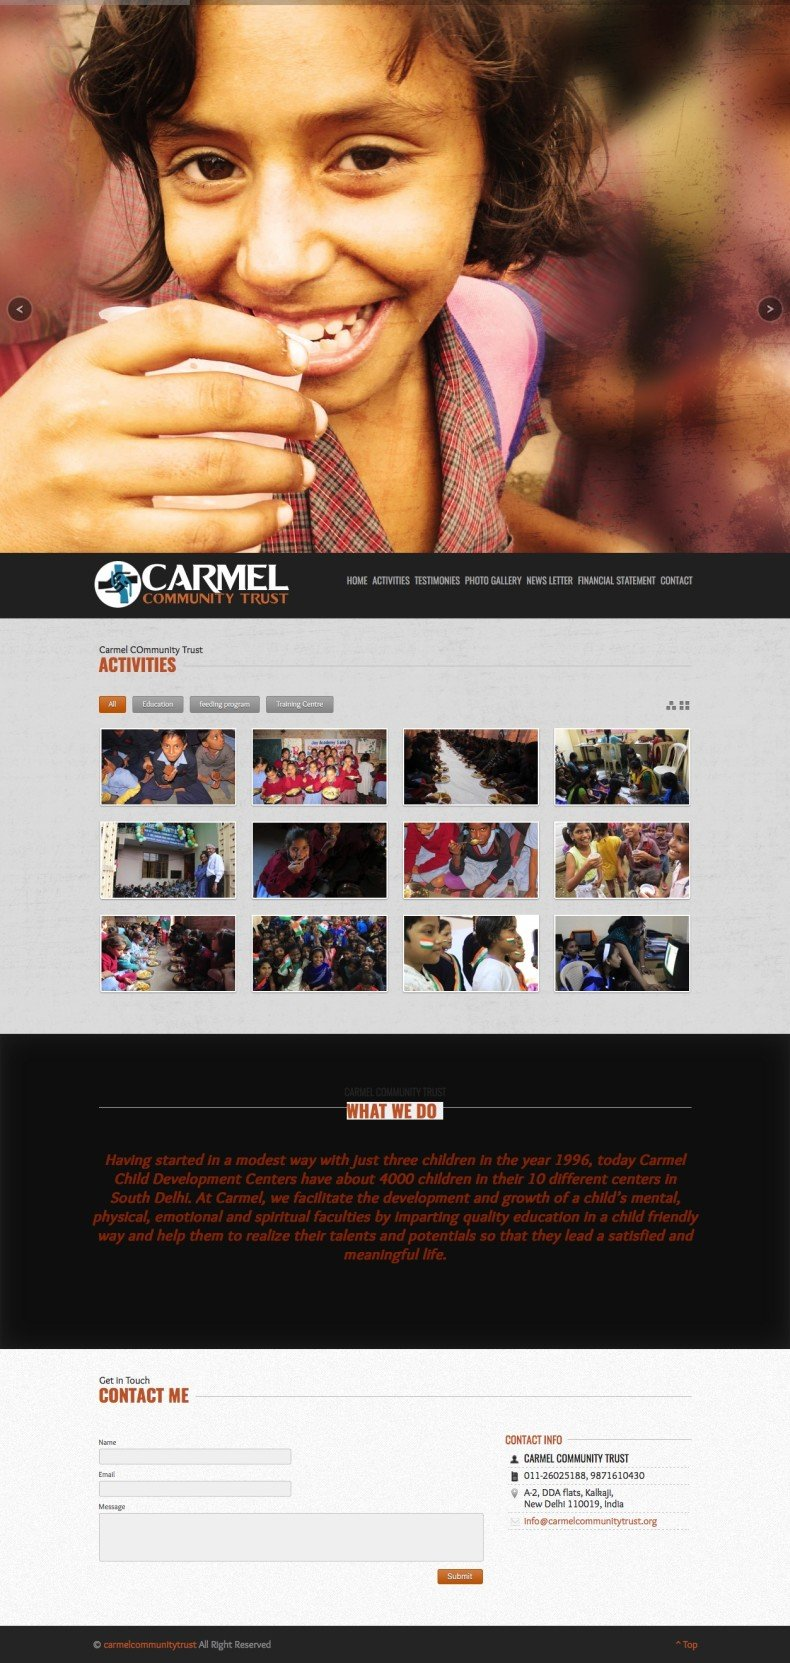 carmelcommunitytrust » Carmel Community Trust